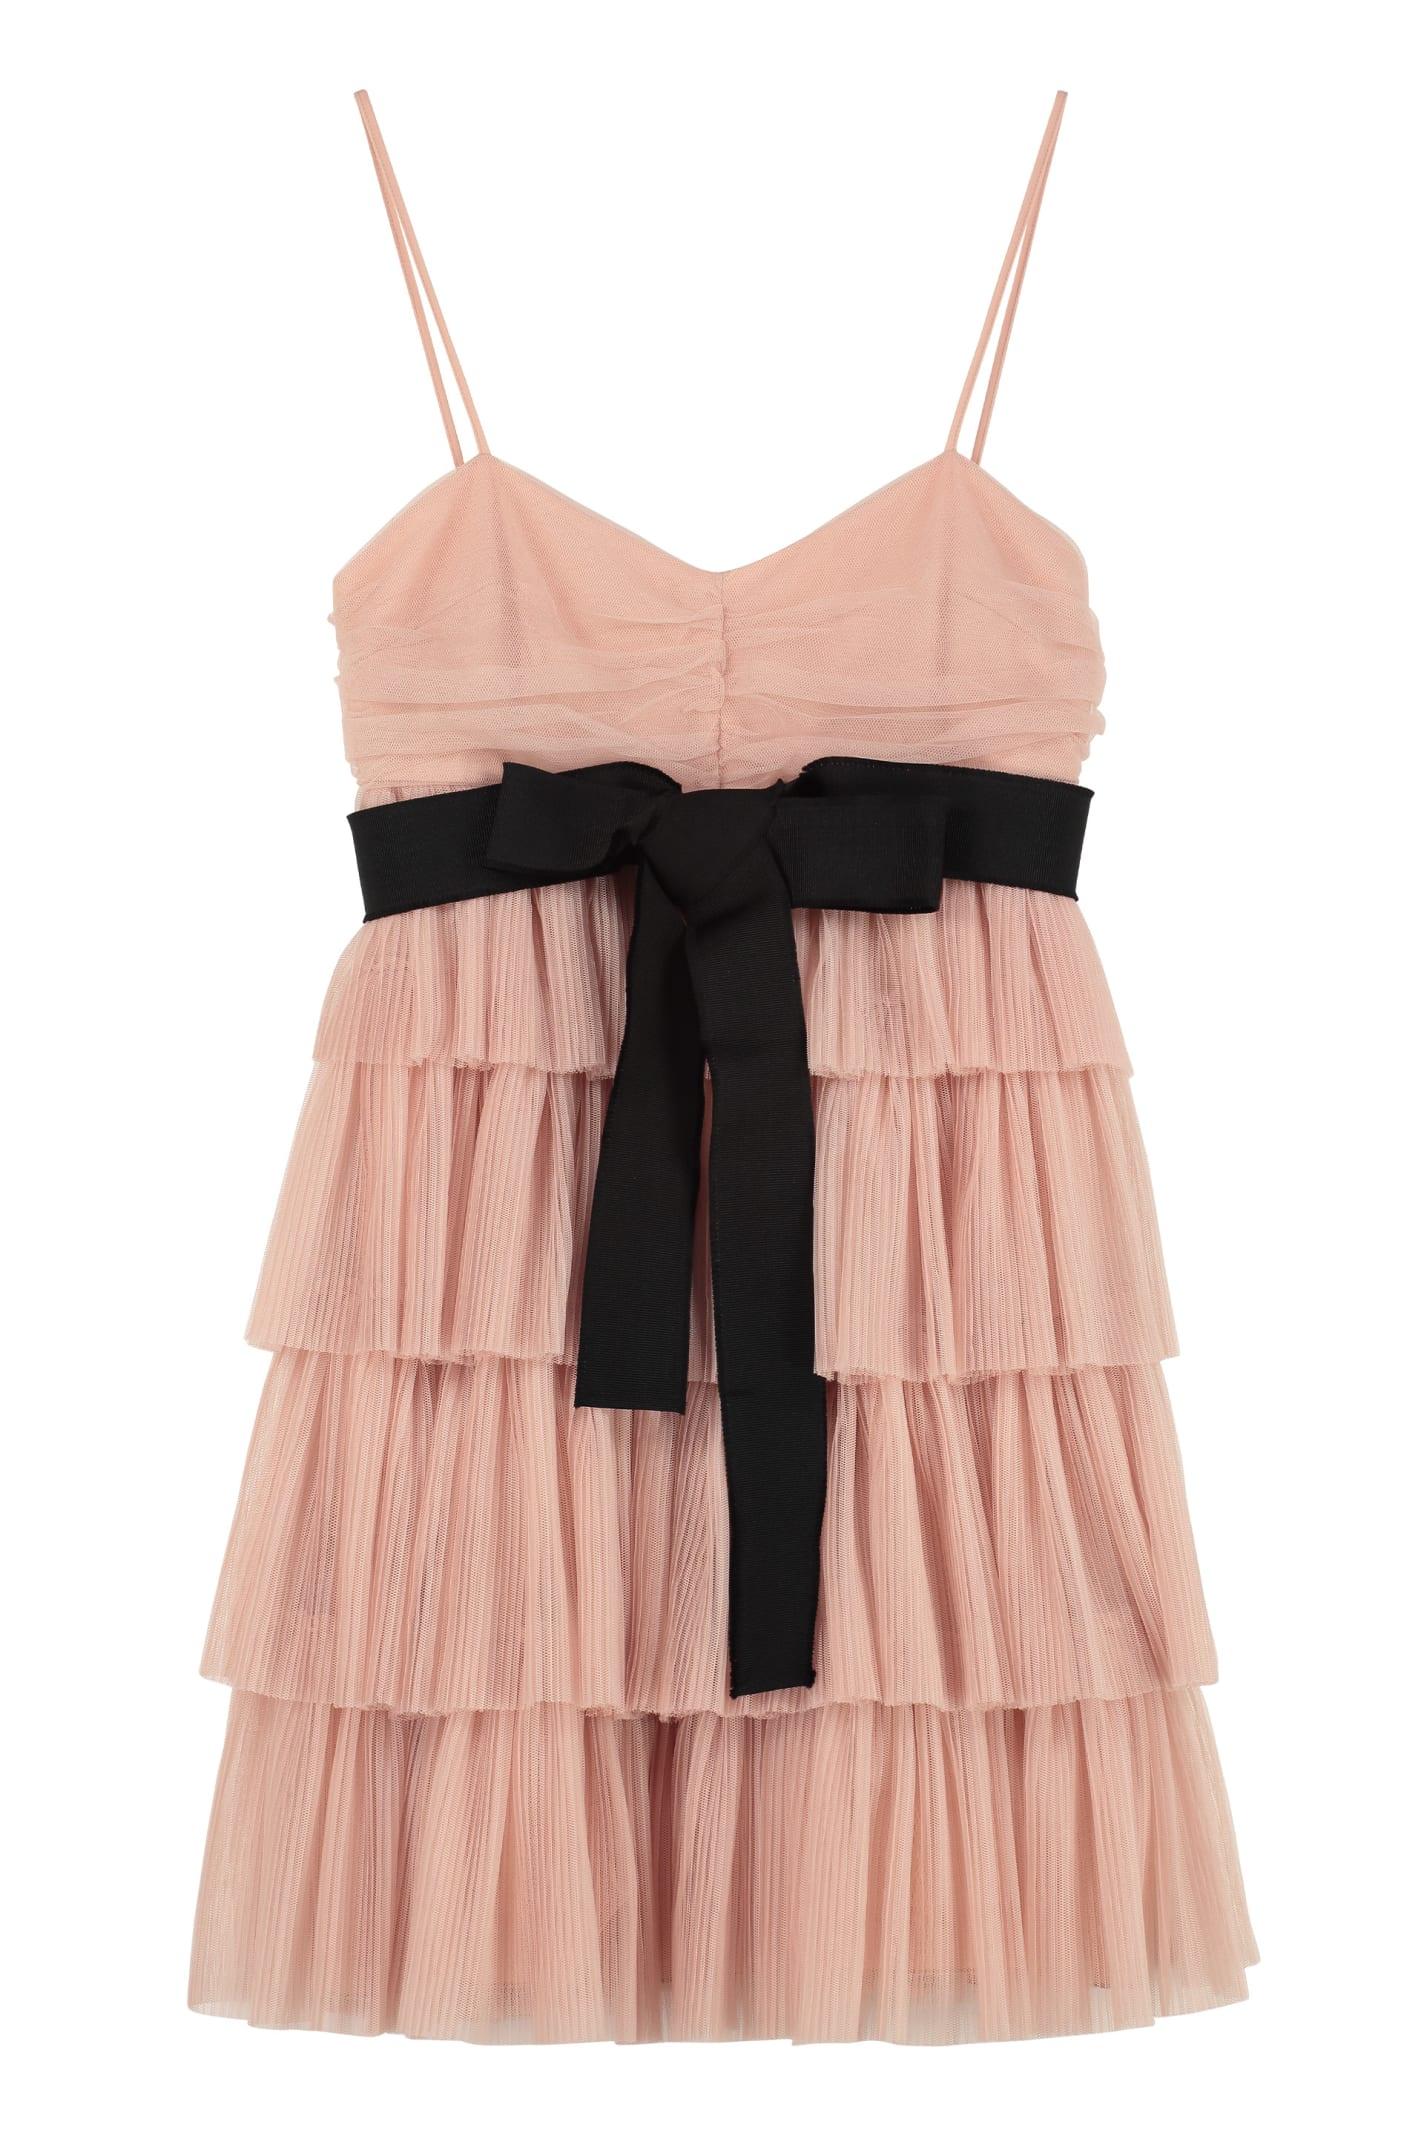 RED Valentino Ruffled Tulle Mini Dress